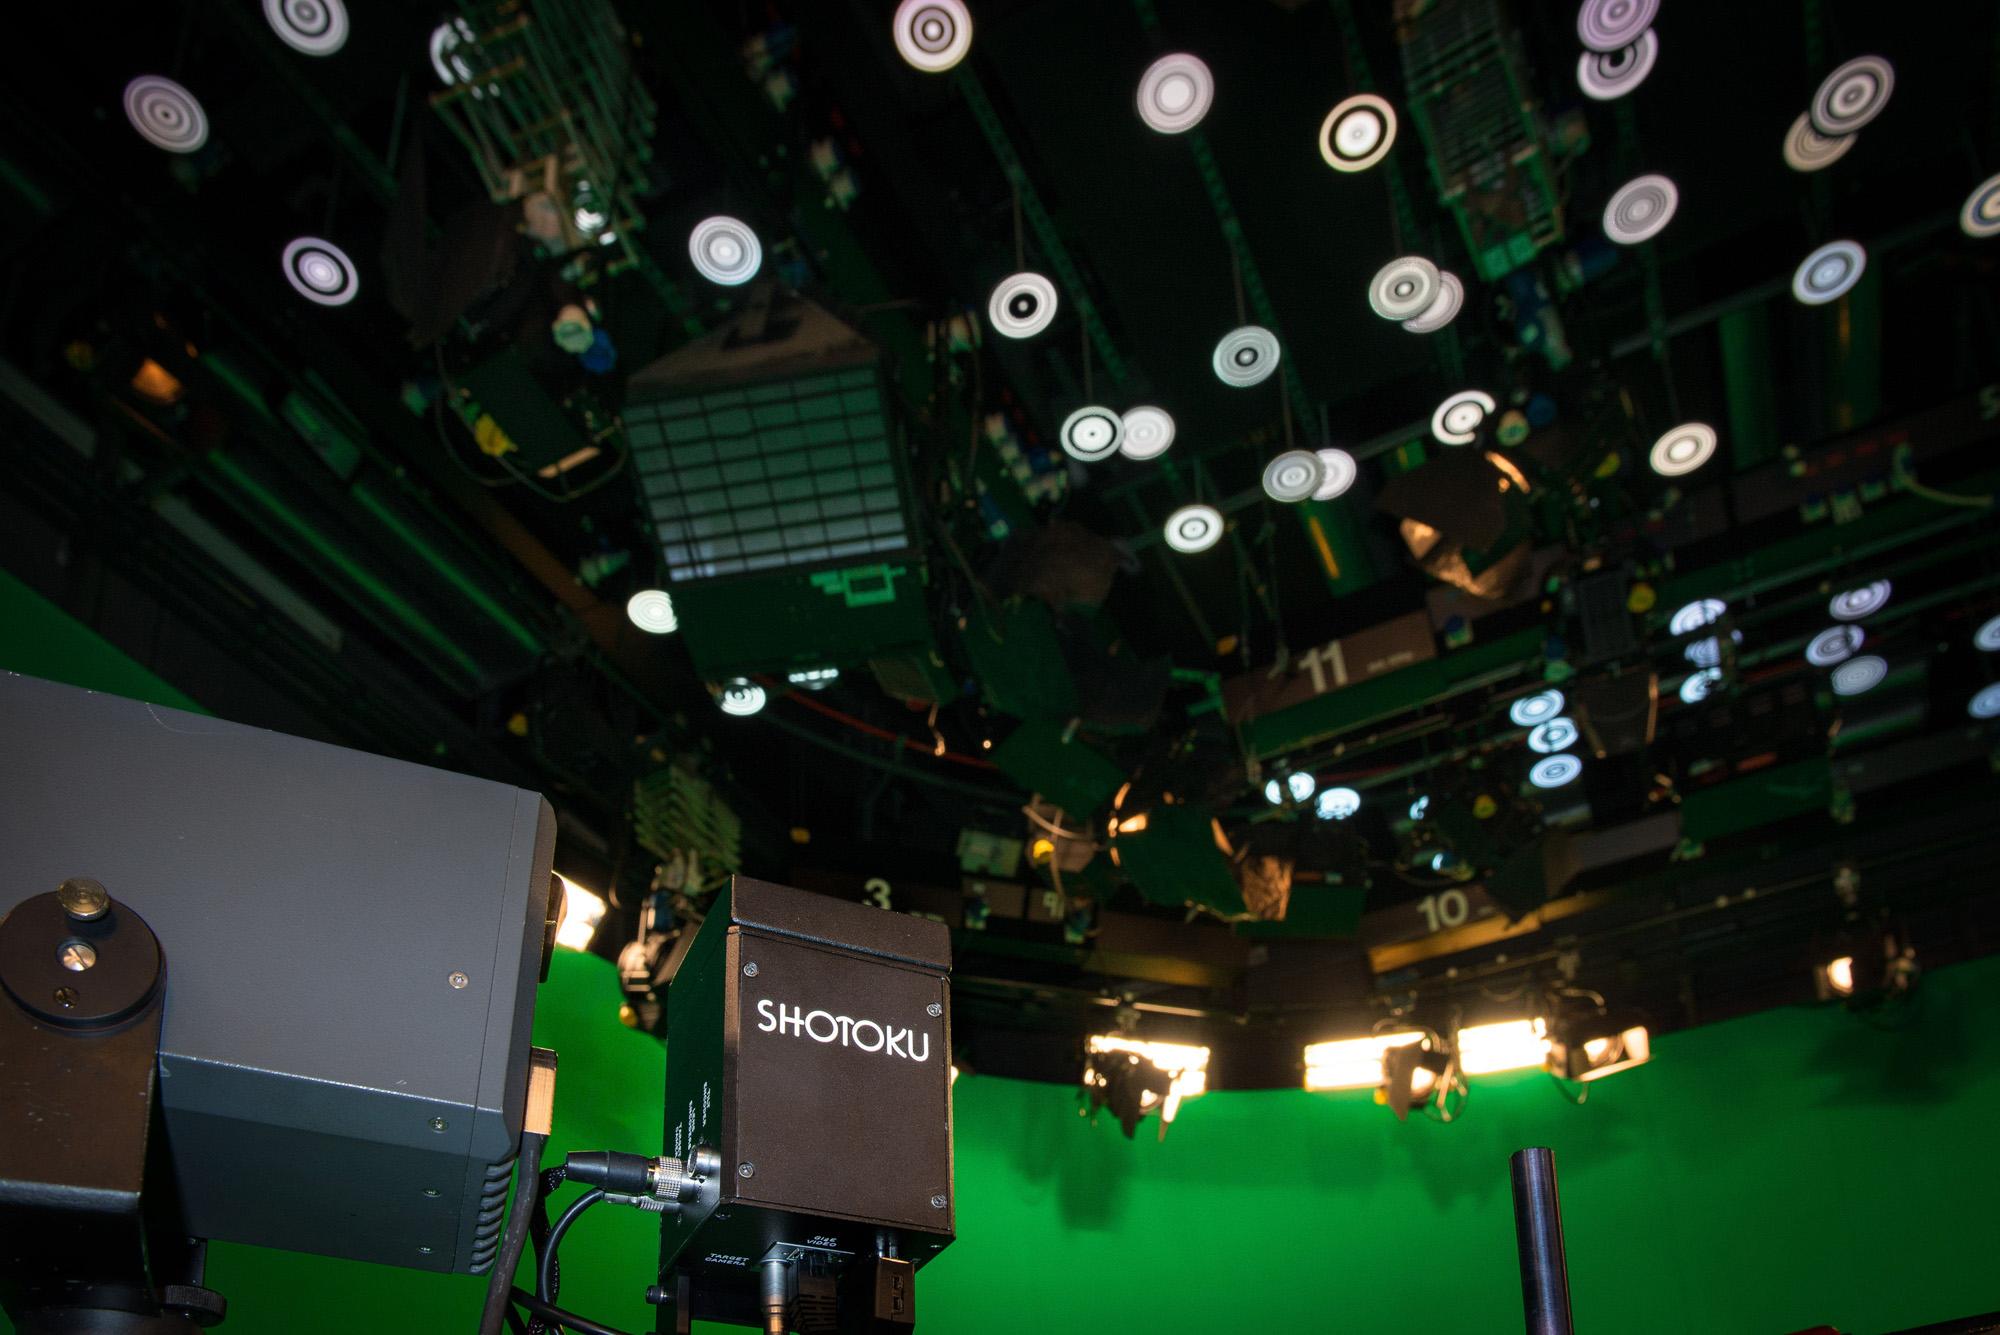 Shotoku Free-d2 Camera and Markers